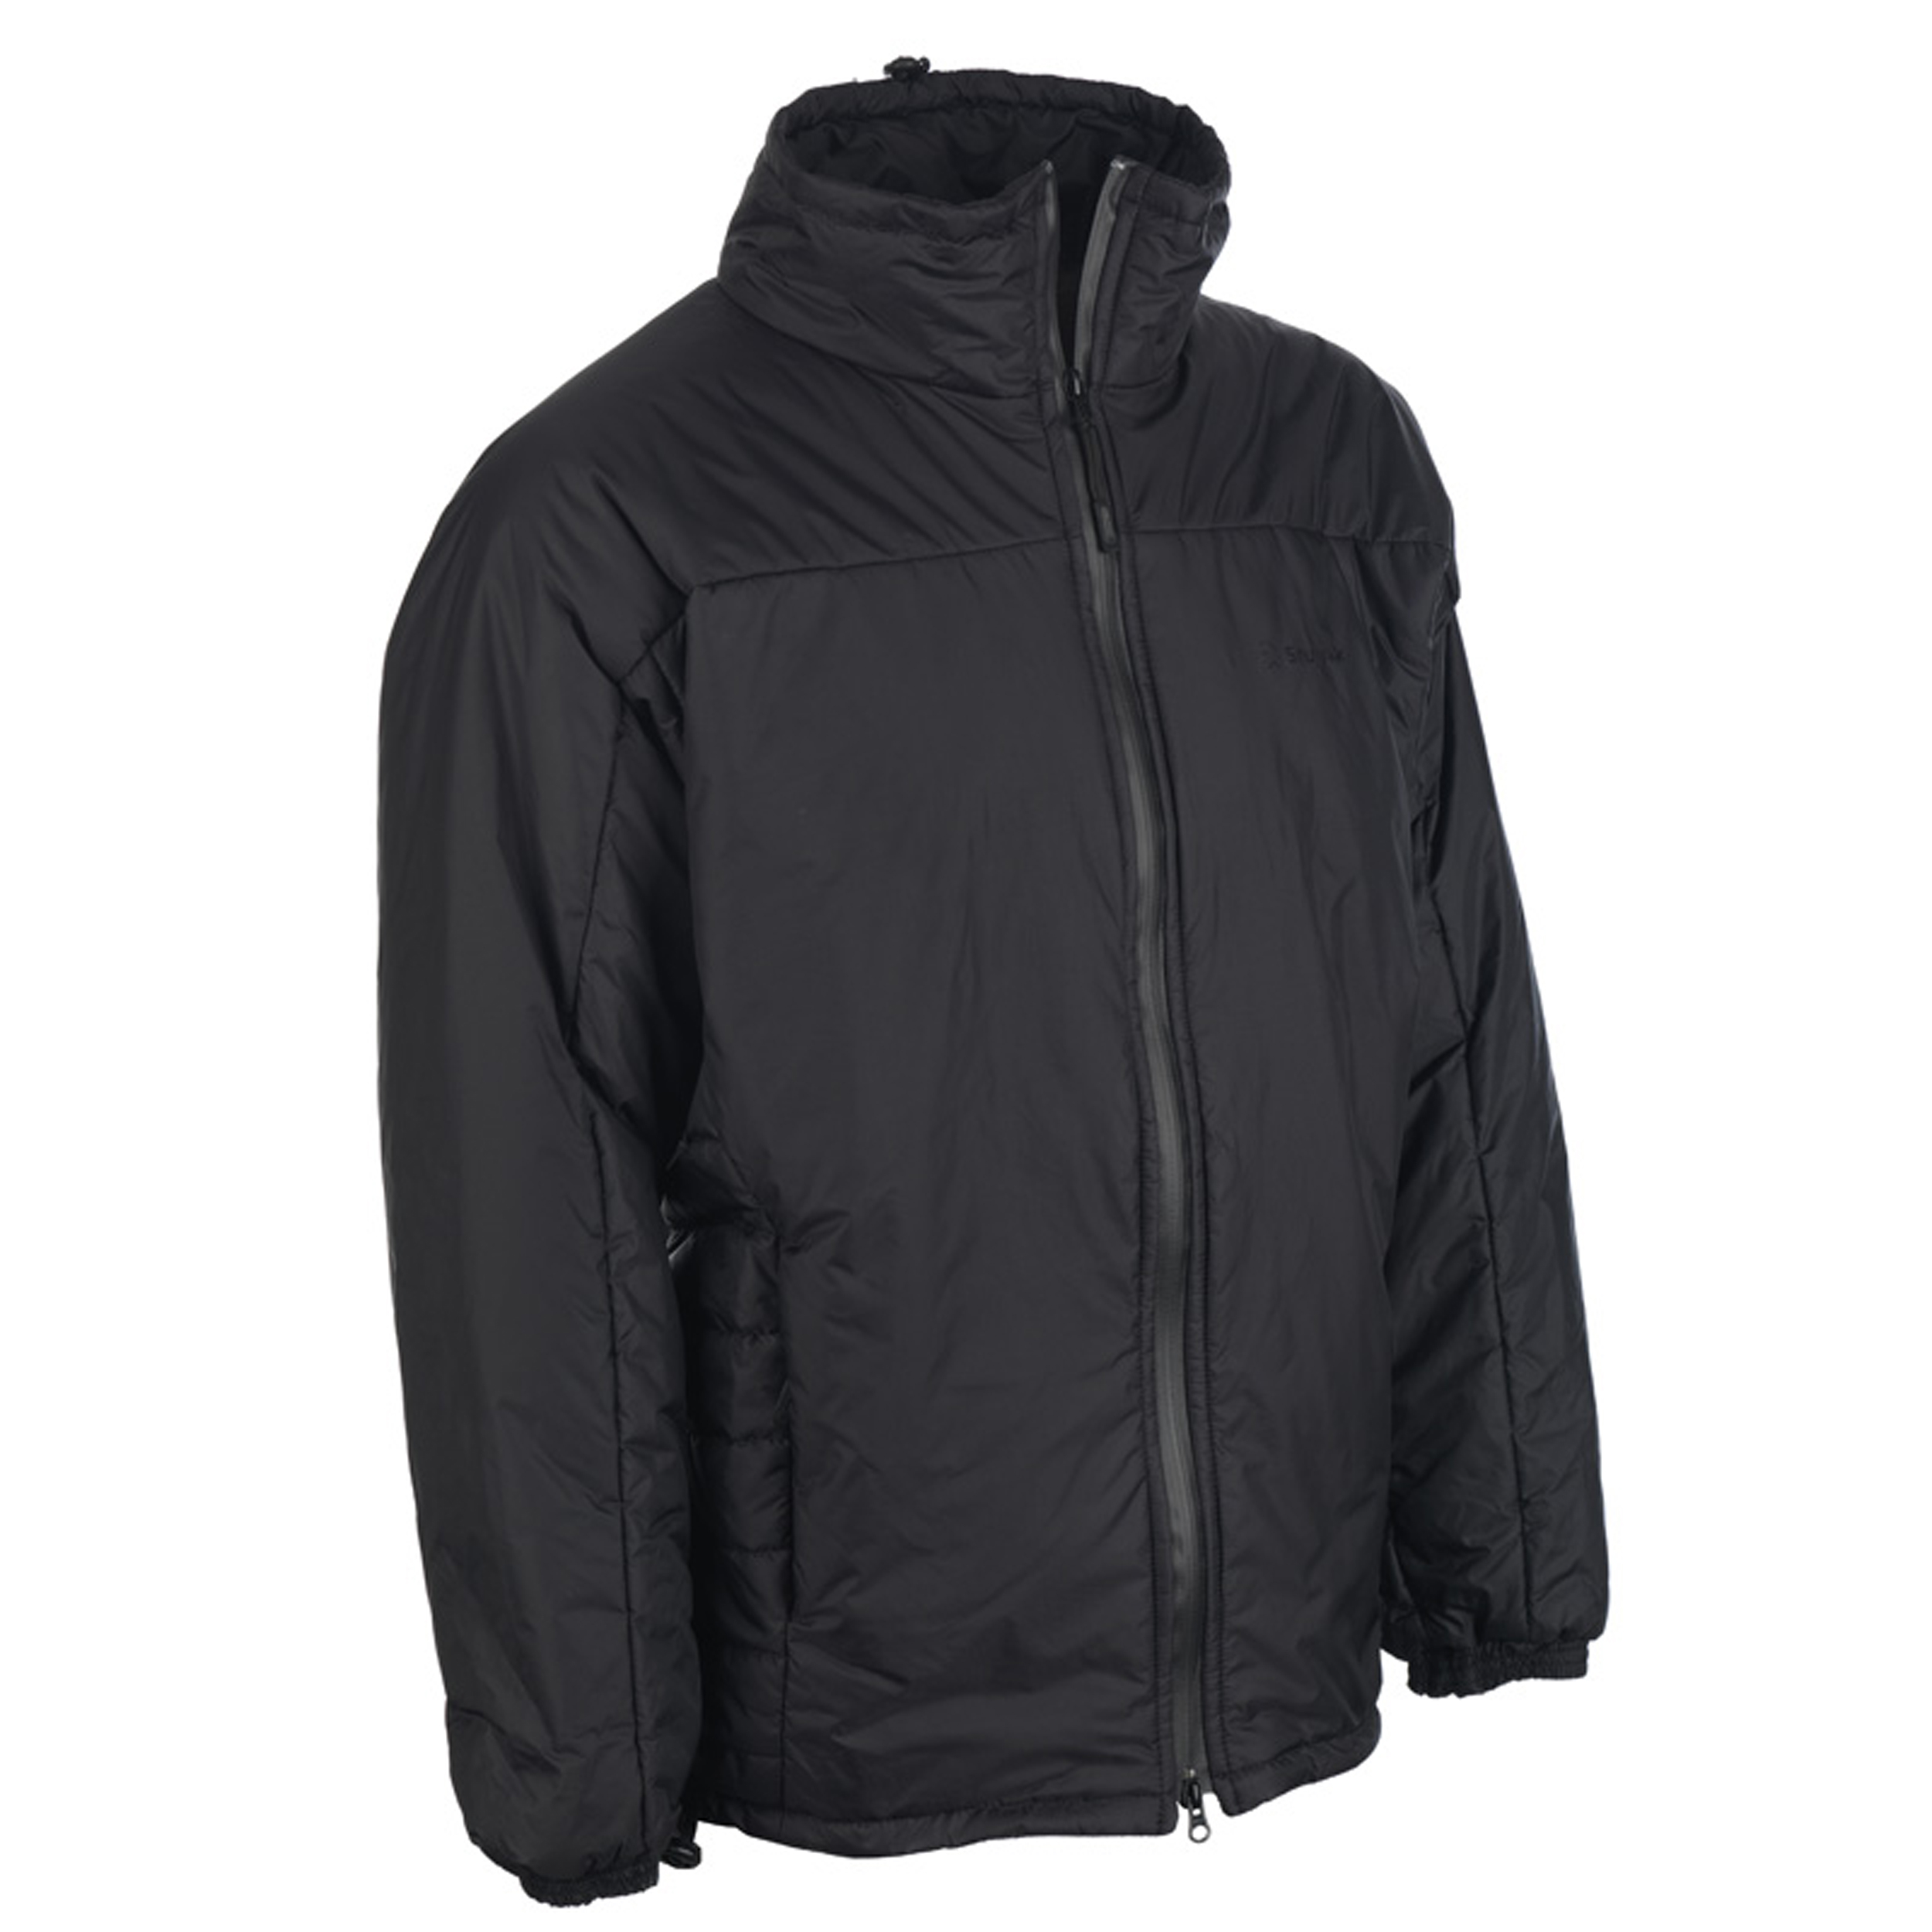 Snugpak Sj9 Jacket Black MD